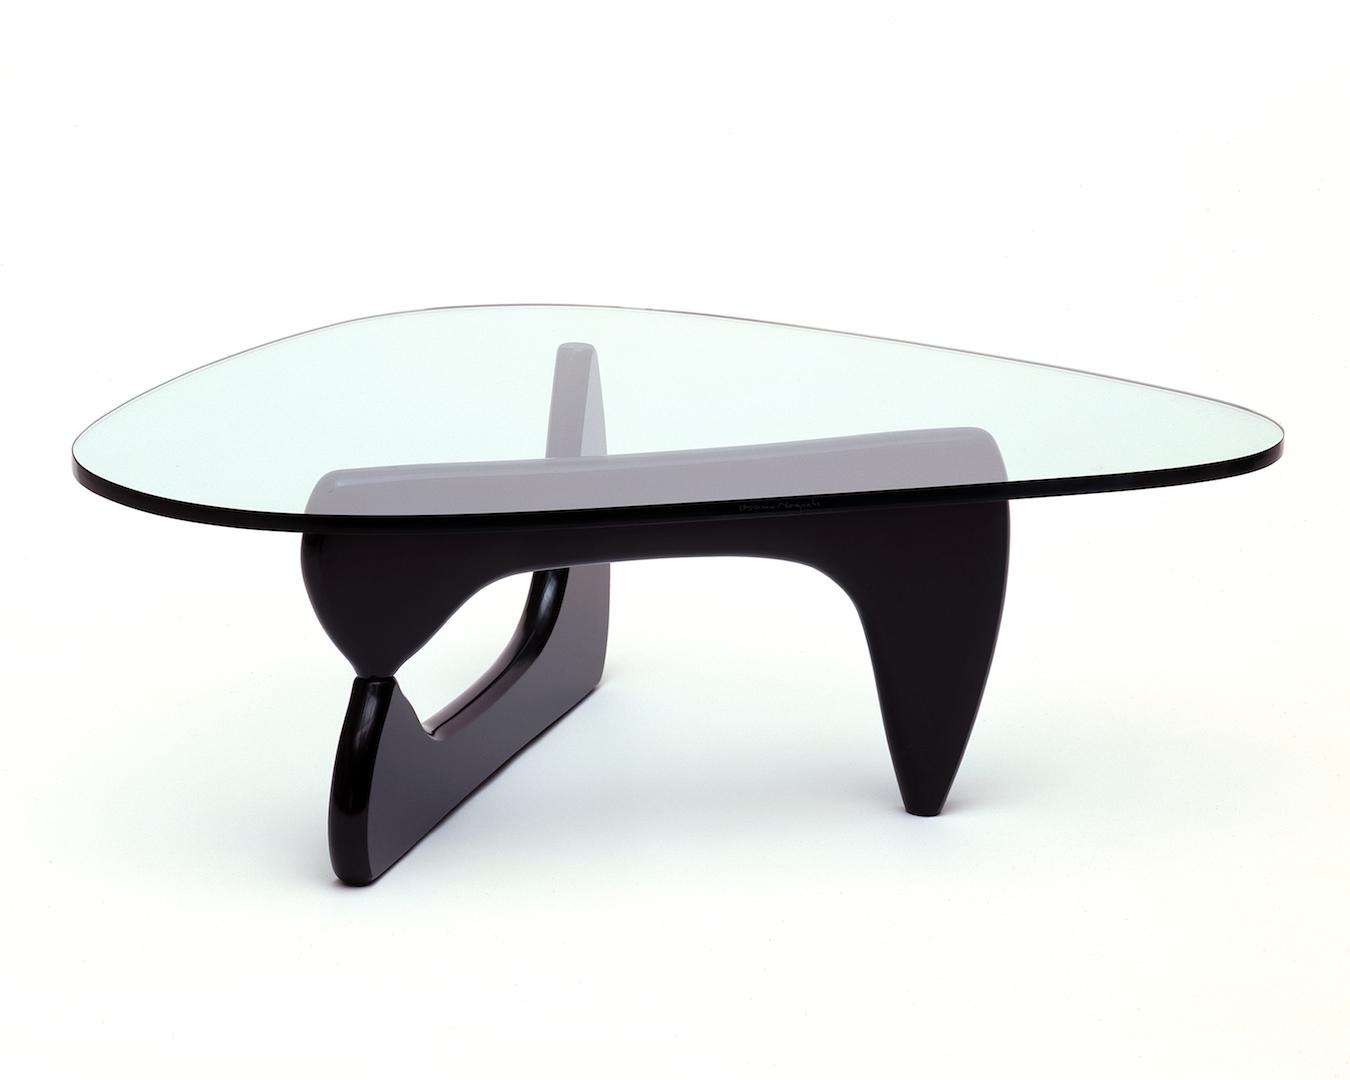 00803_Noguchi_Coffee_Table_IN-50.jpg